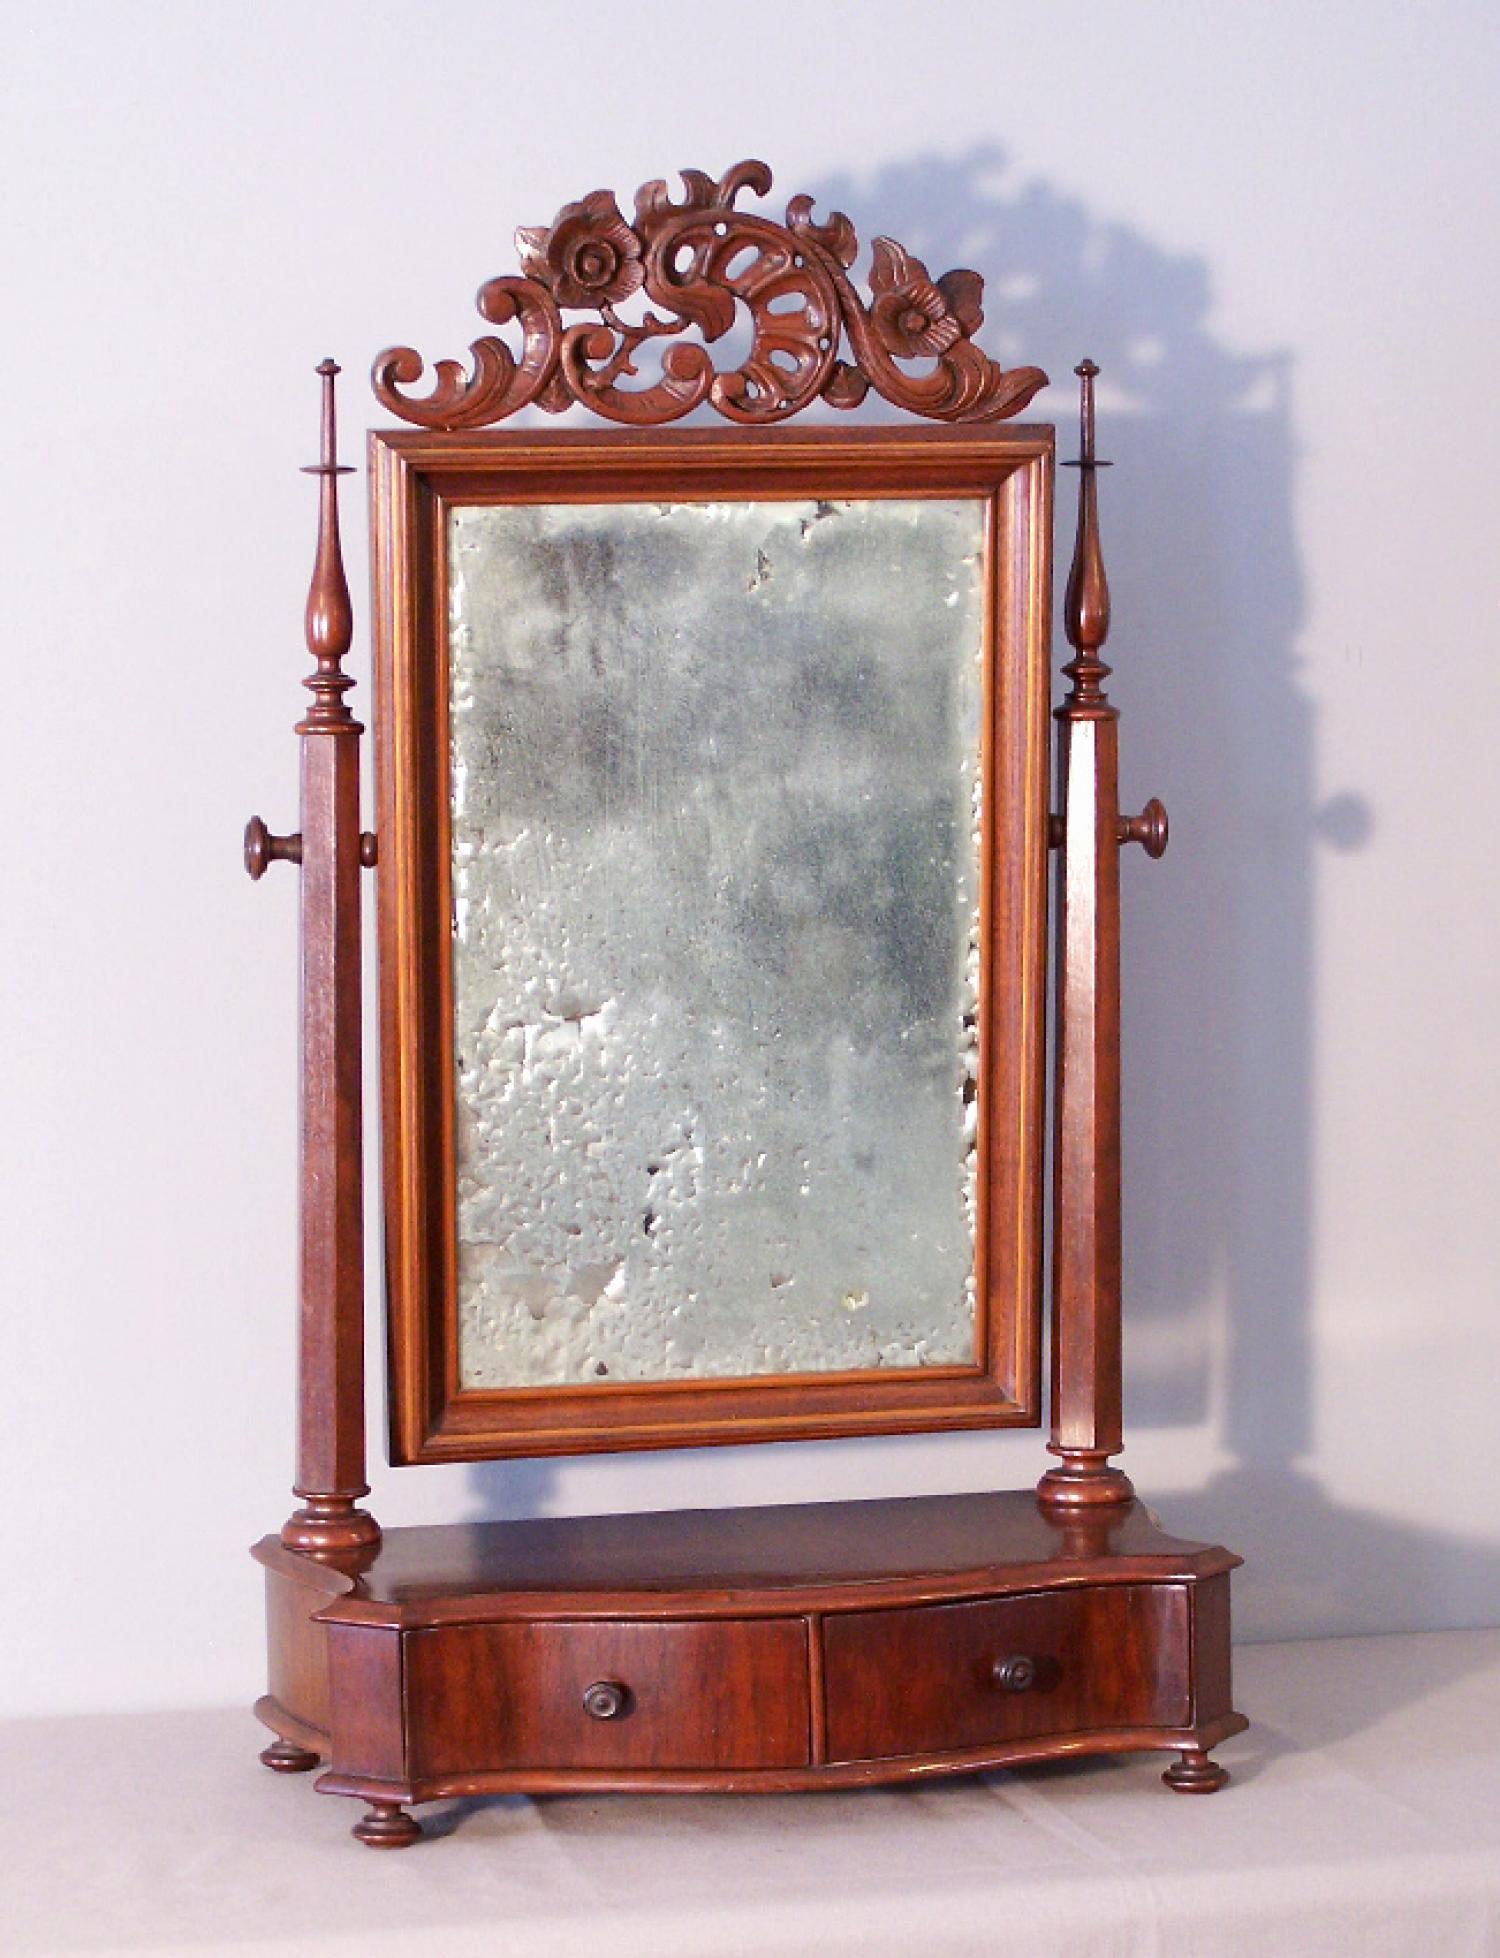 American mahogany dressing shaving mirror Carl Honberg  c1875